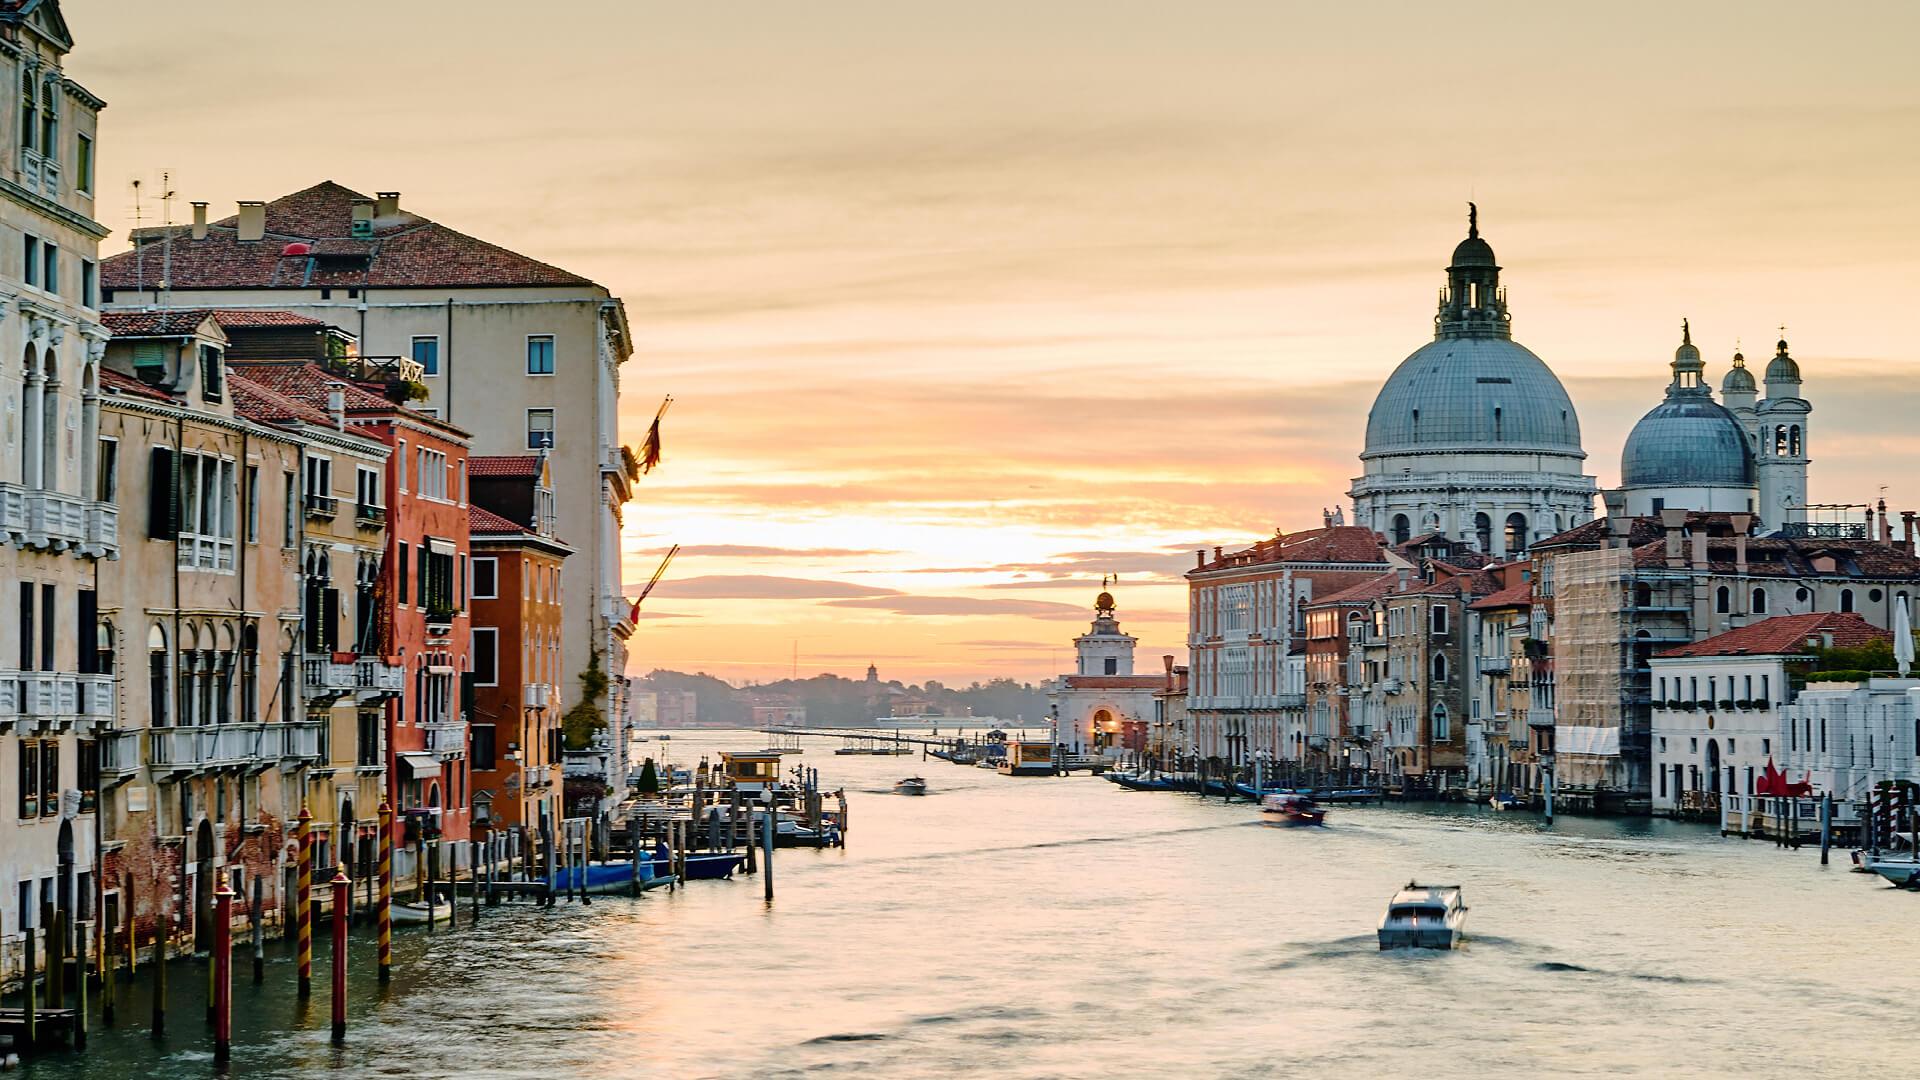 The Grand Canal, Venice | Invisible Cities by Italo Calvino | STIRworld